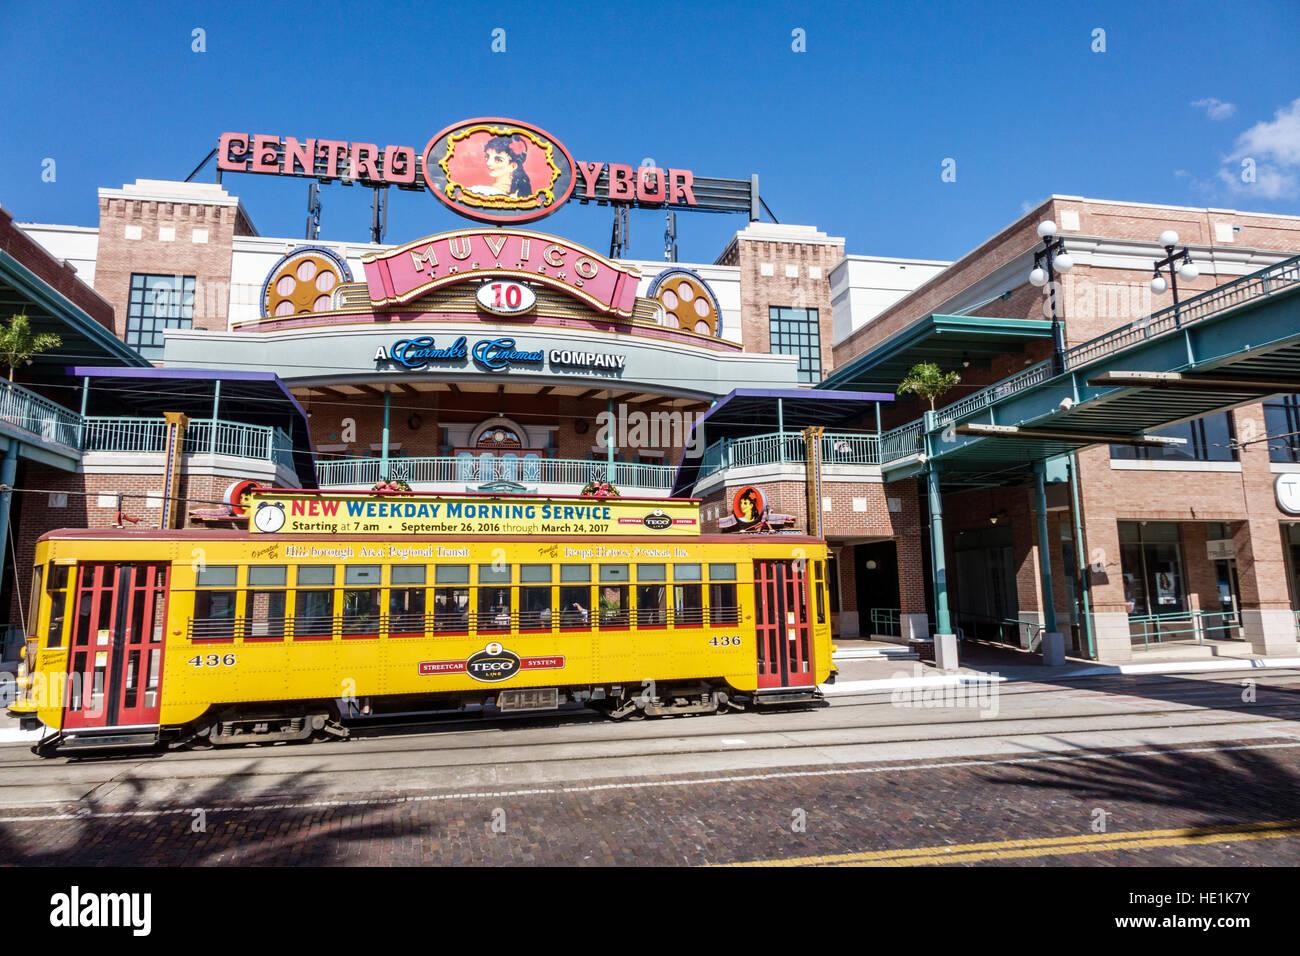 Tampa Florida Ybor City historic neighborhood Centro Ybor complex shopping TECO Line street car - Stock Image